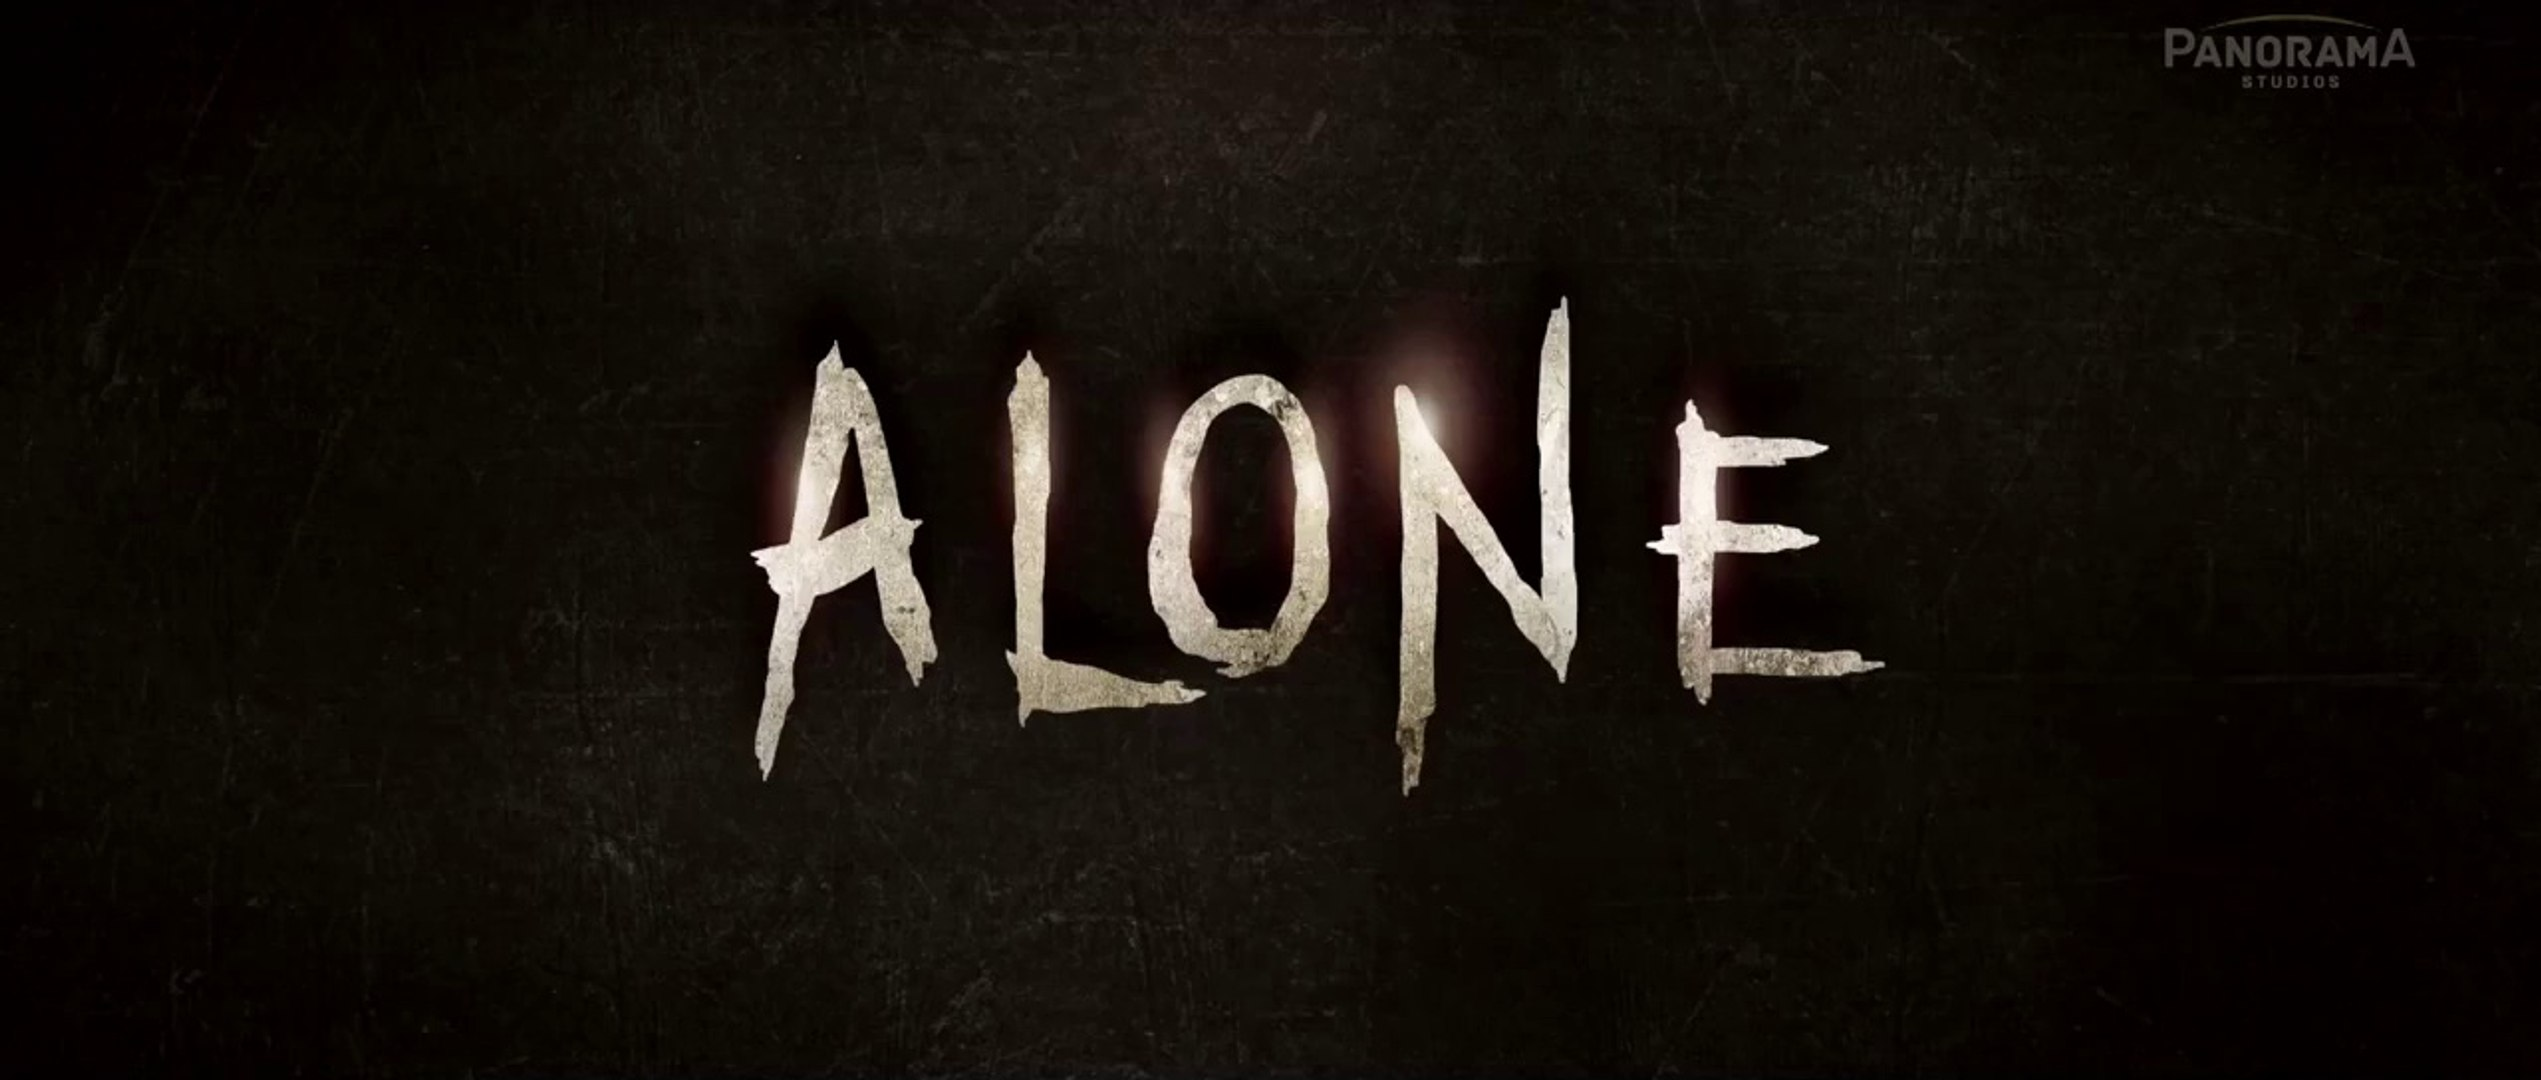 Alone (2015) Hindi Movie Theatrical Trailer Ft. Bipasha Basu, Karan Singh Grover - HD 720p Video - V